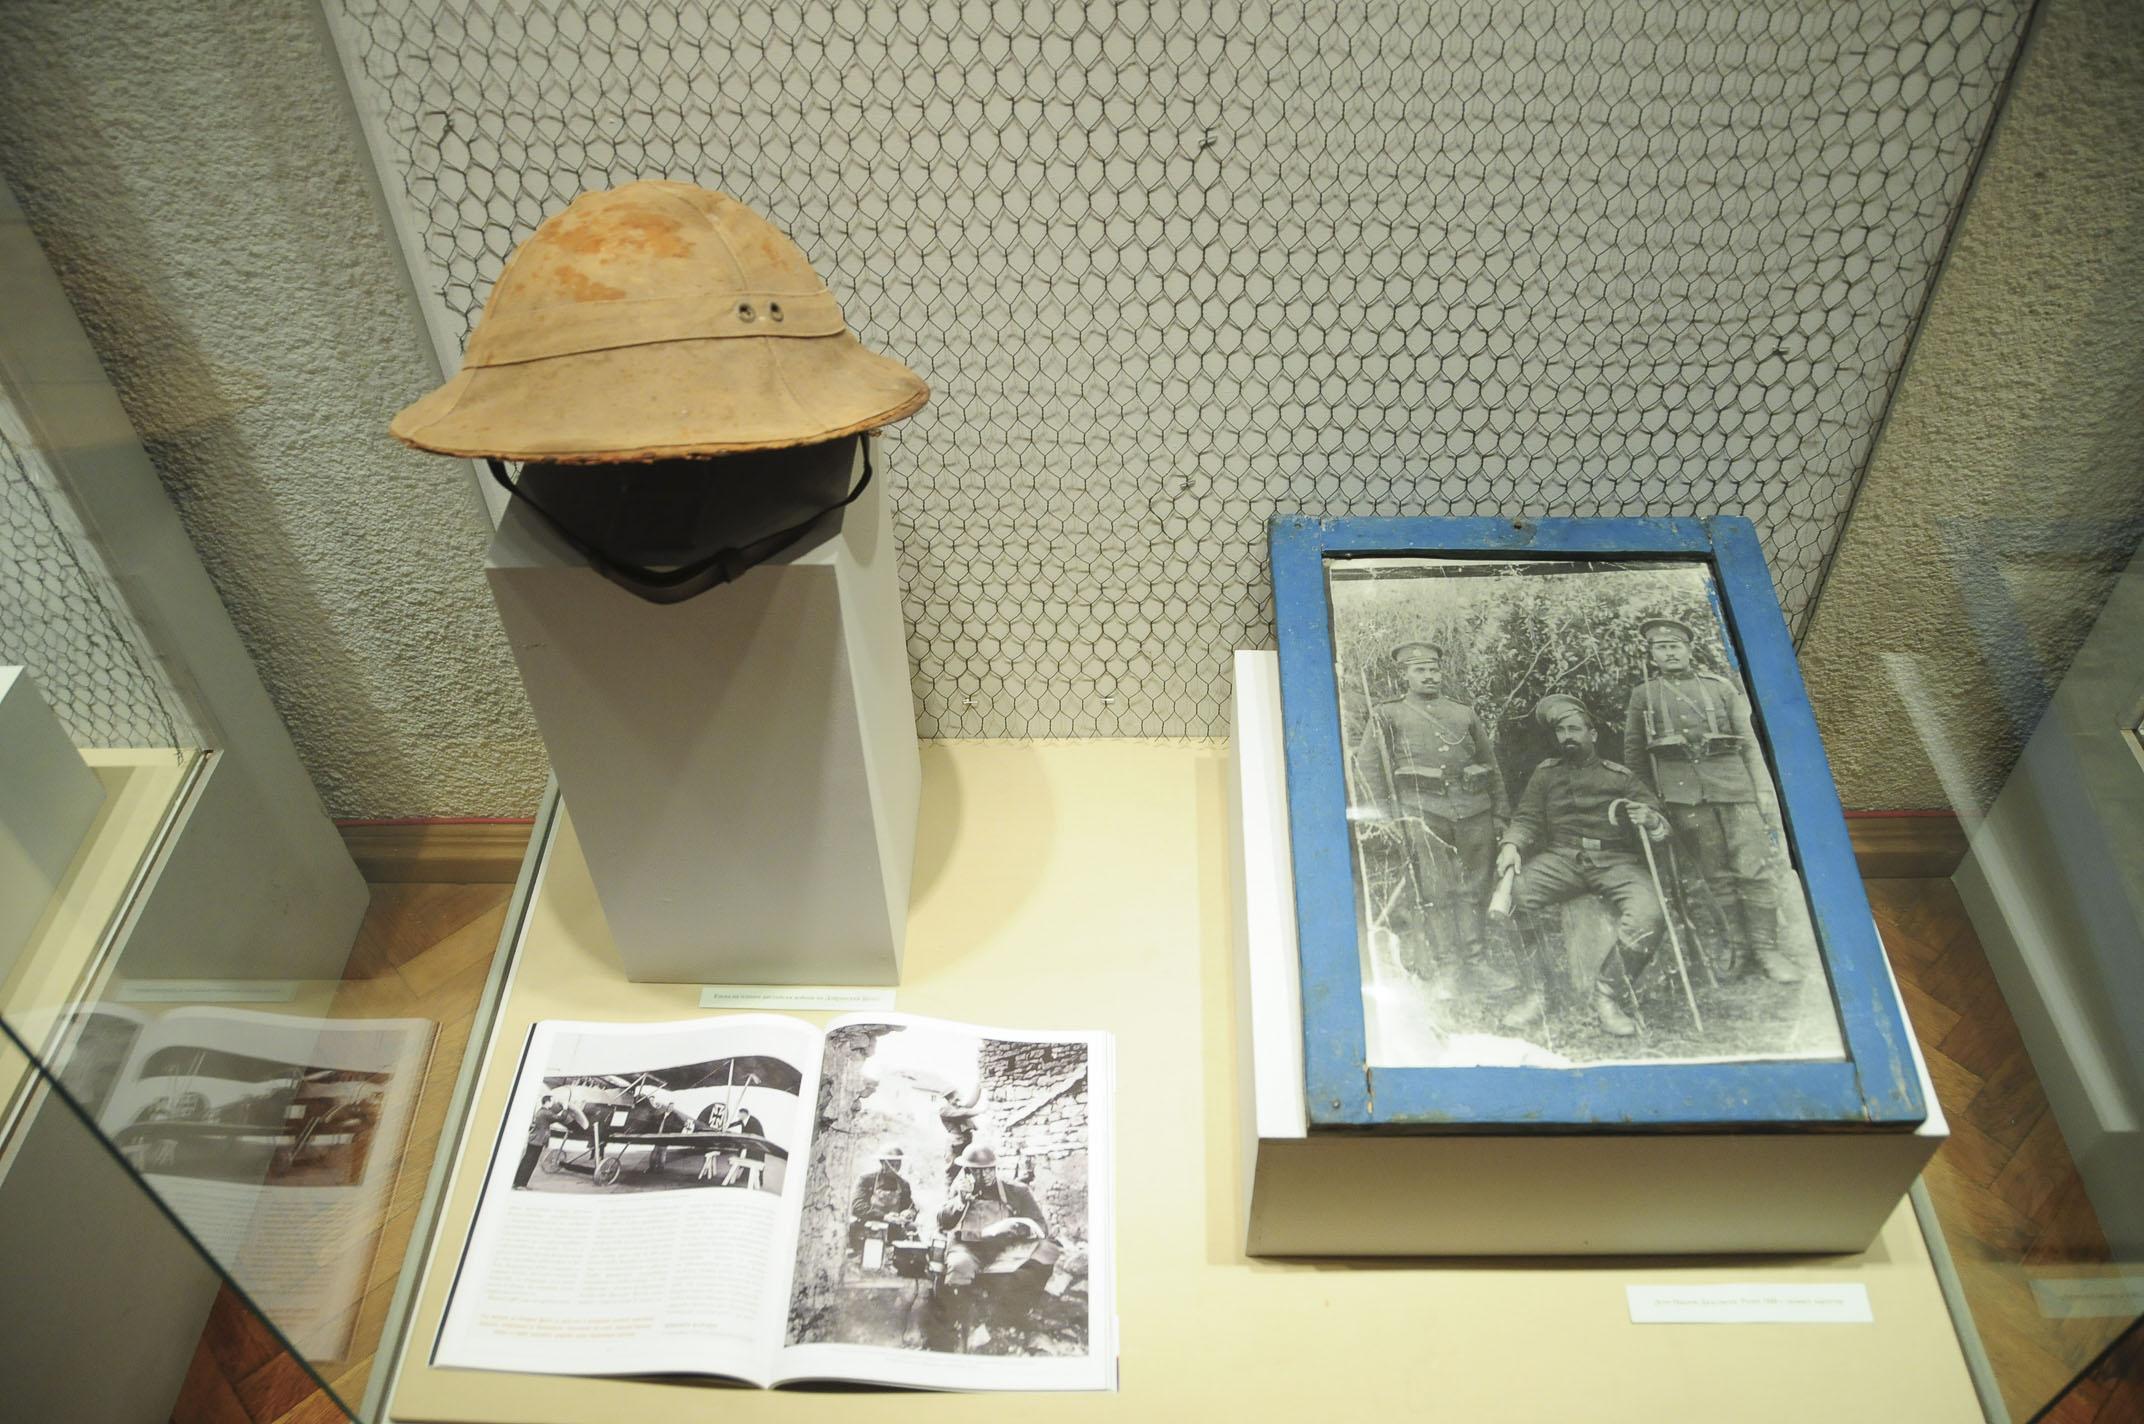 troyan-museum-srykleni-spomeni-2